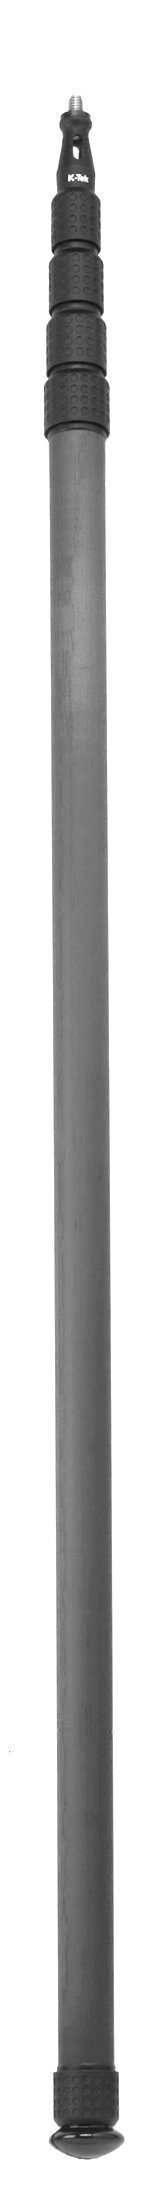 16ft K-Tek Fishpole